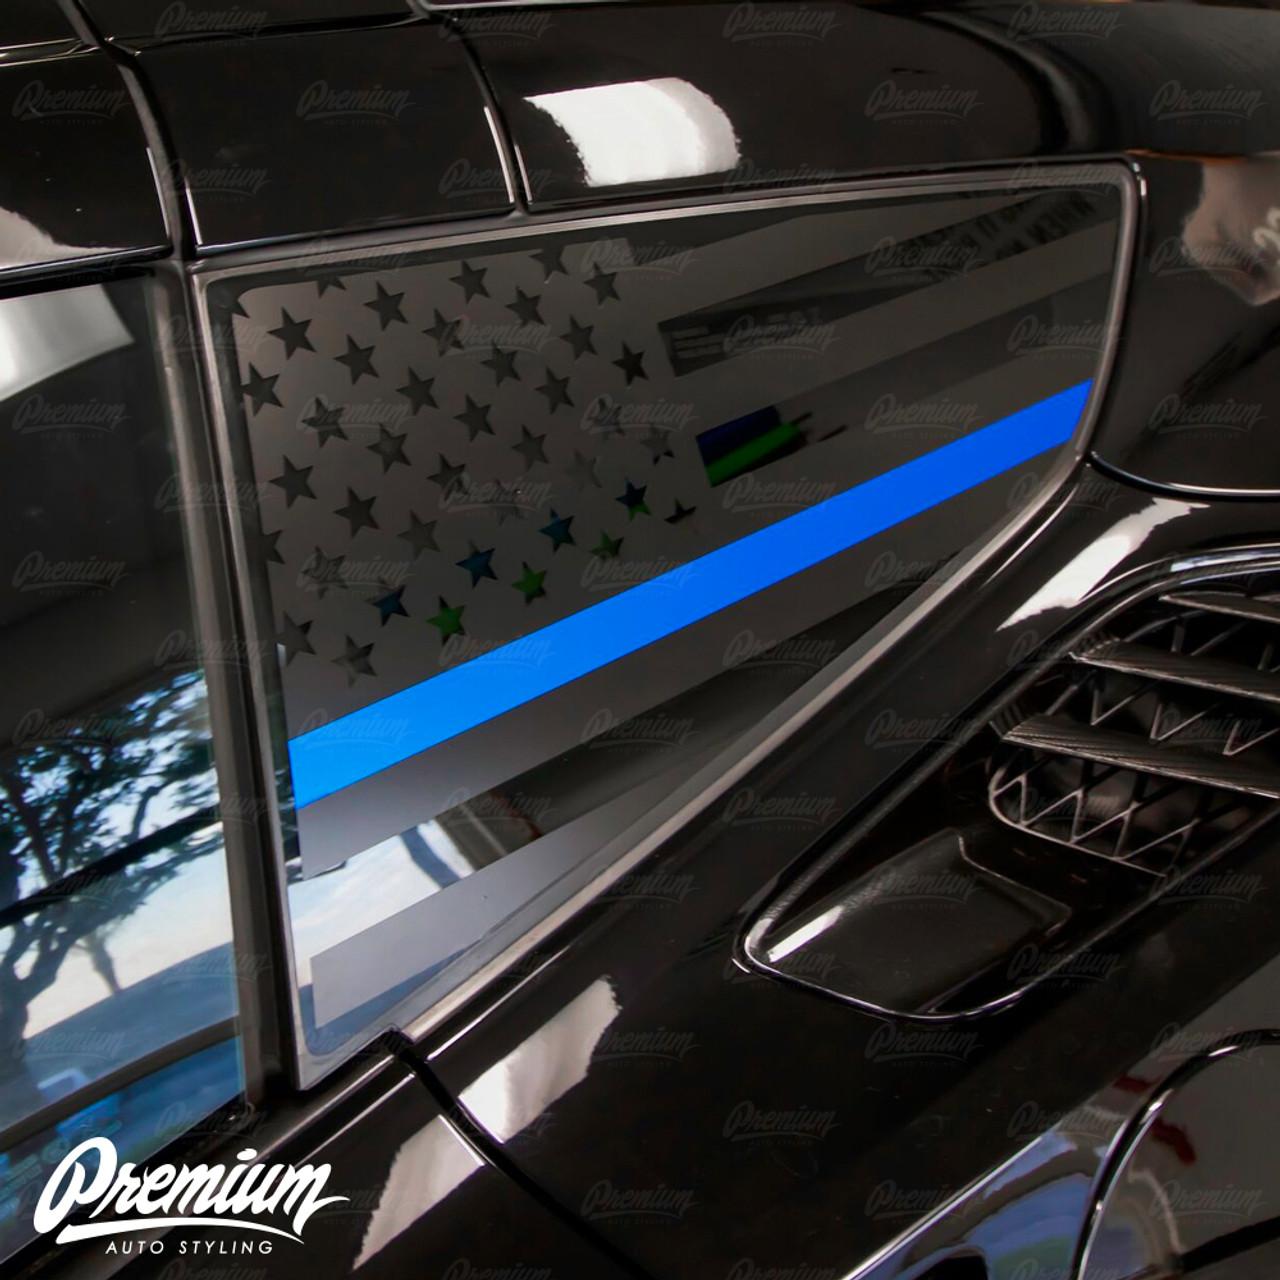 Pair of Premium MARINES Custom Gloss Decals for Car Truck SUV Window Sticker